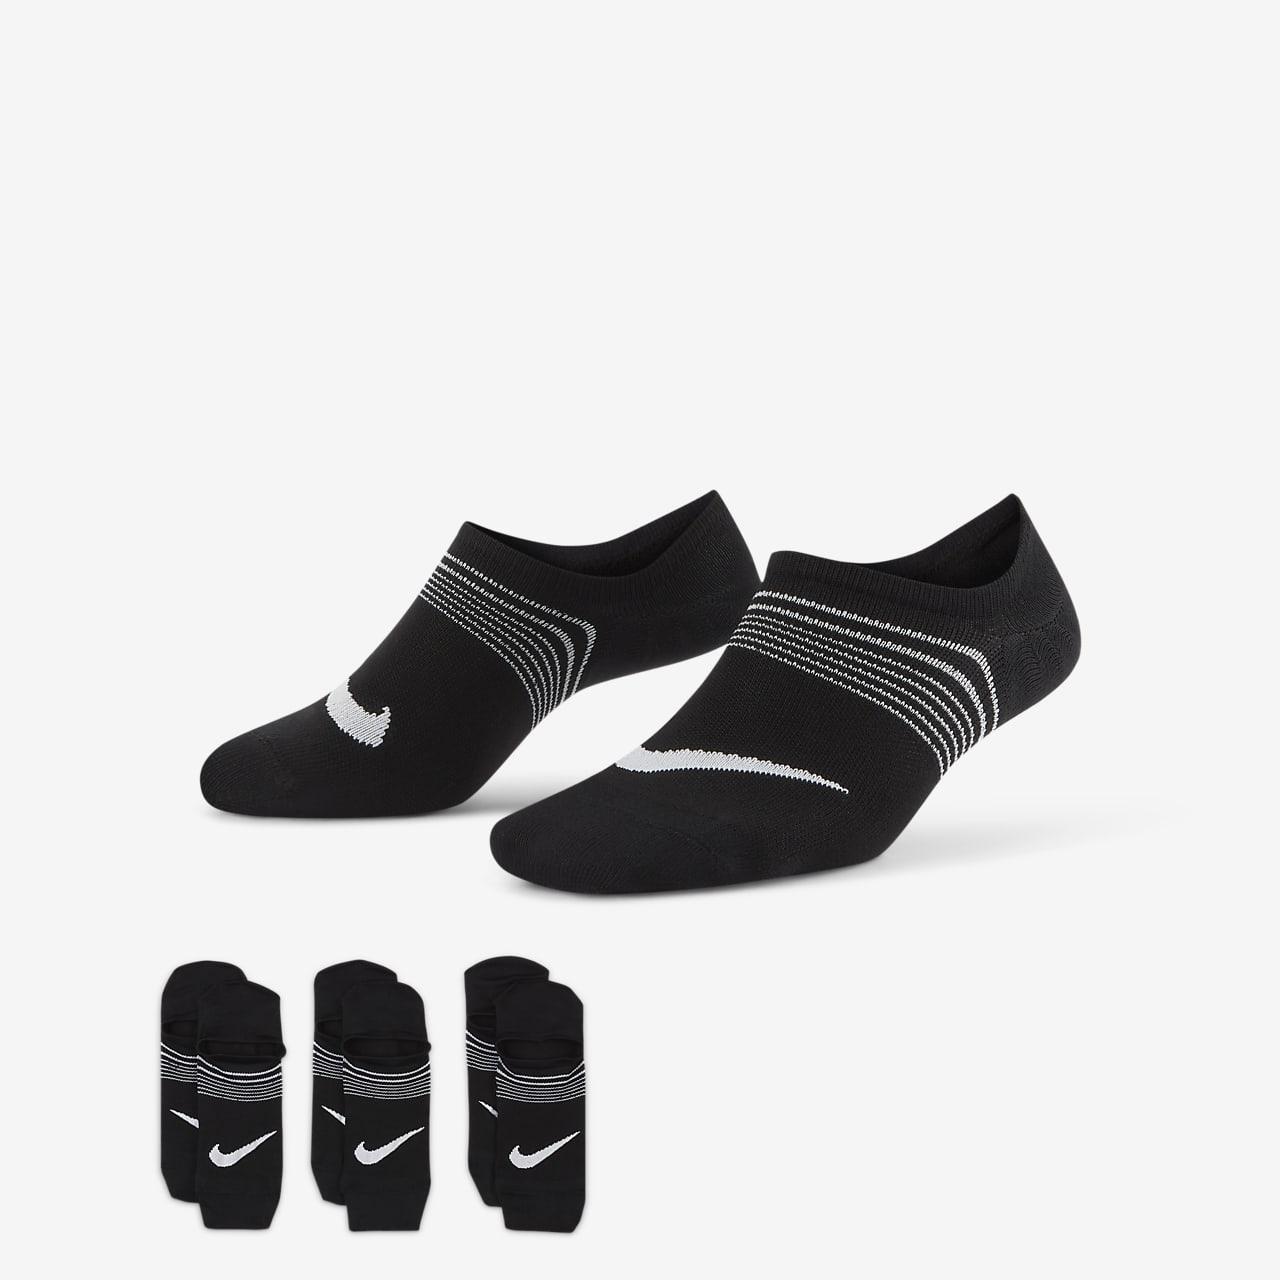 Salvapiedi da training Nike Everyday Plus Lightweight (3 paia) - Donna